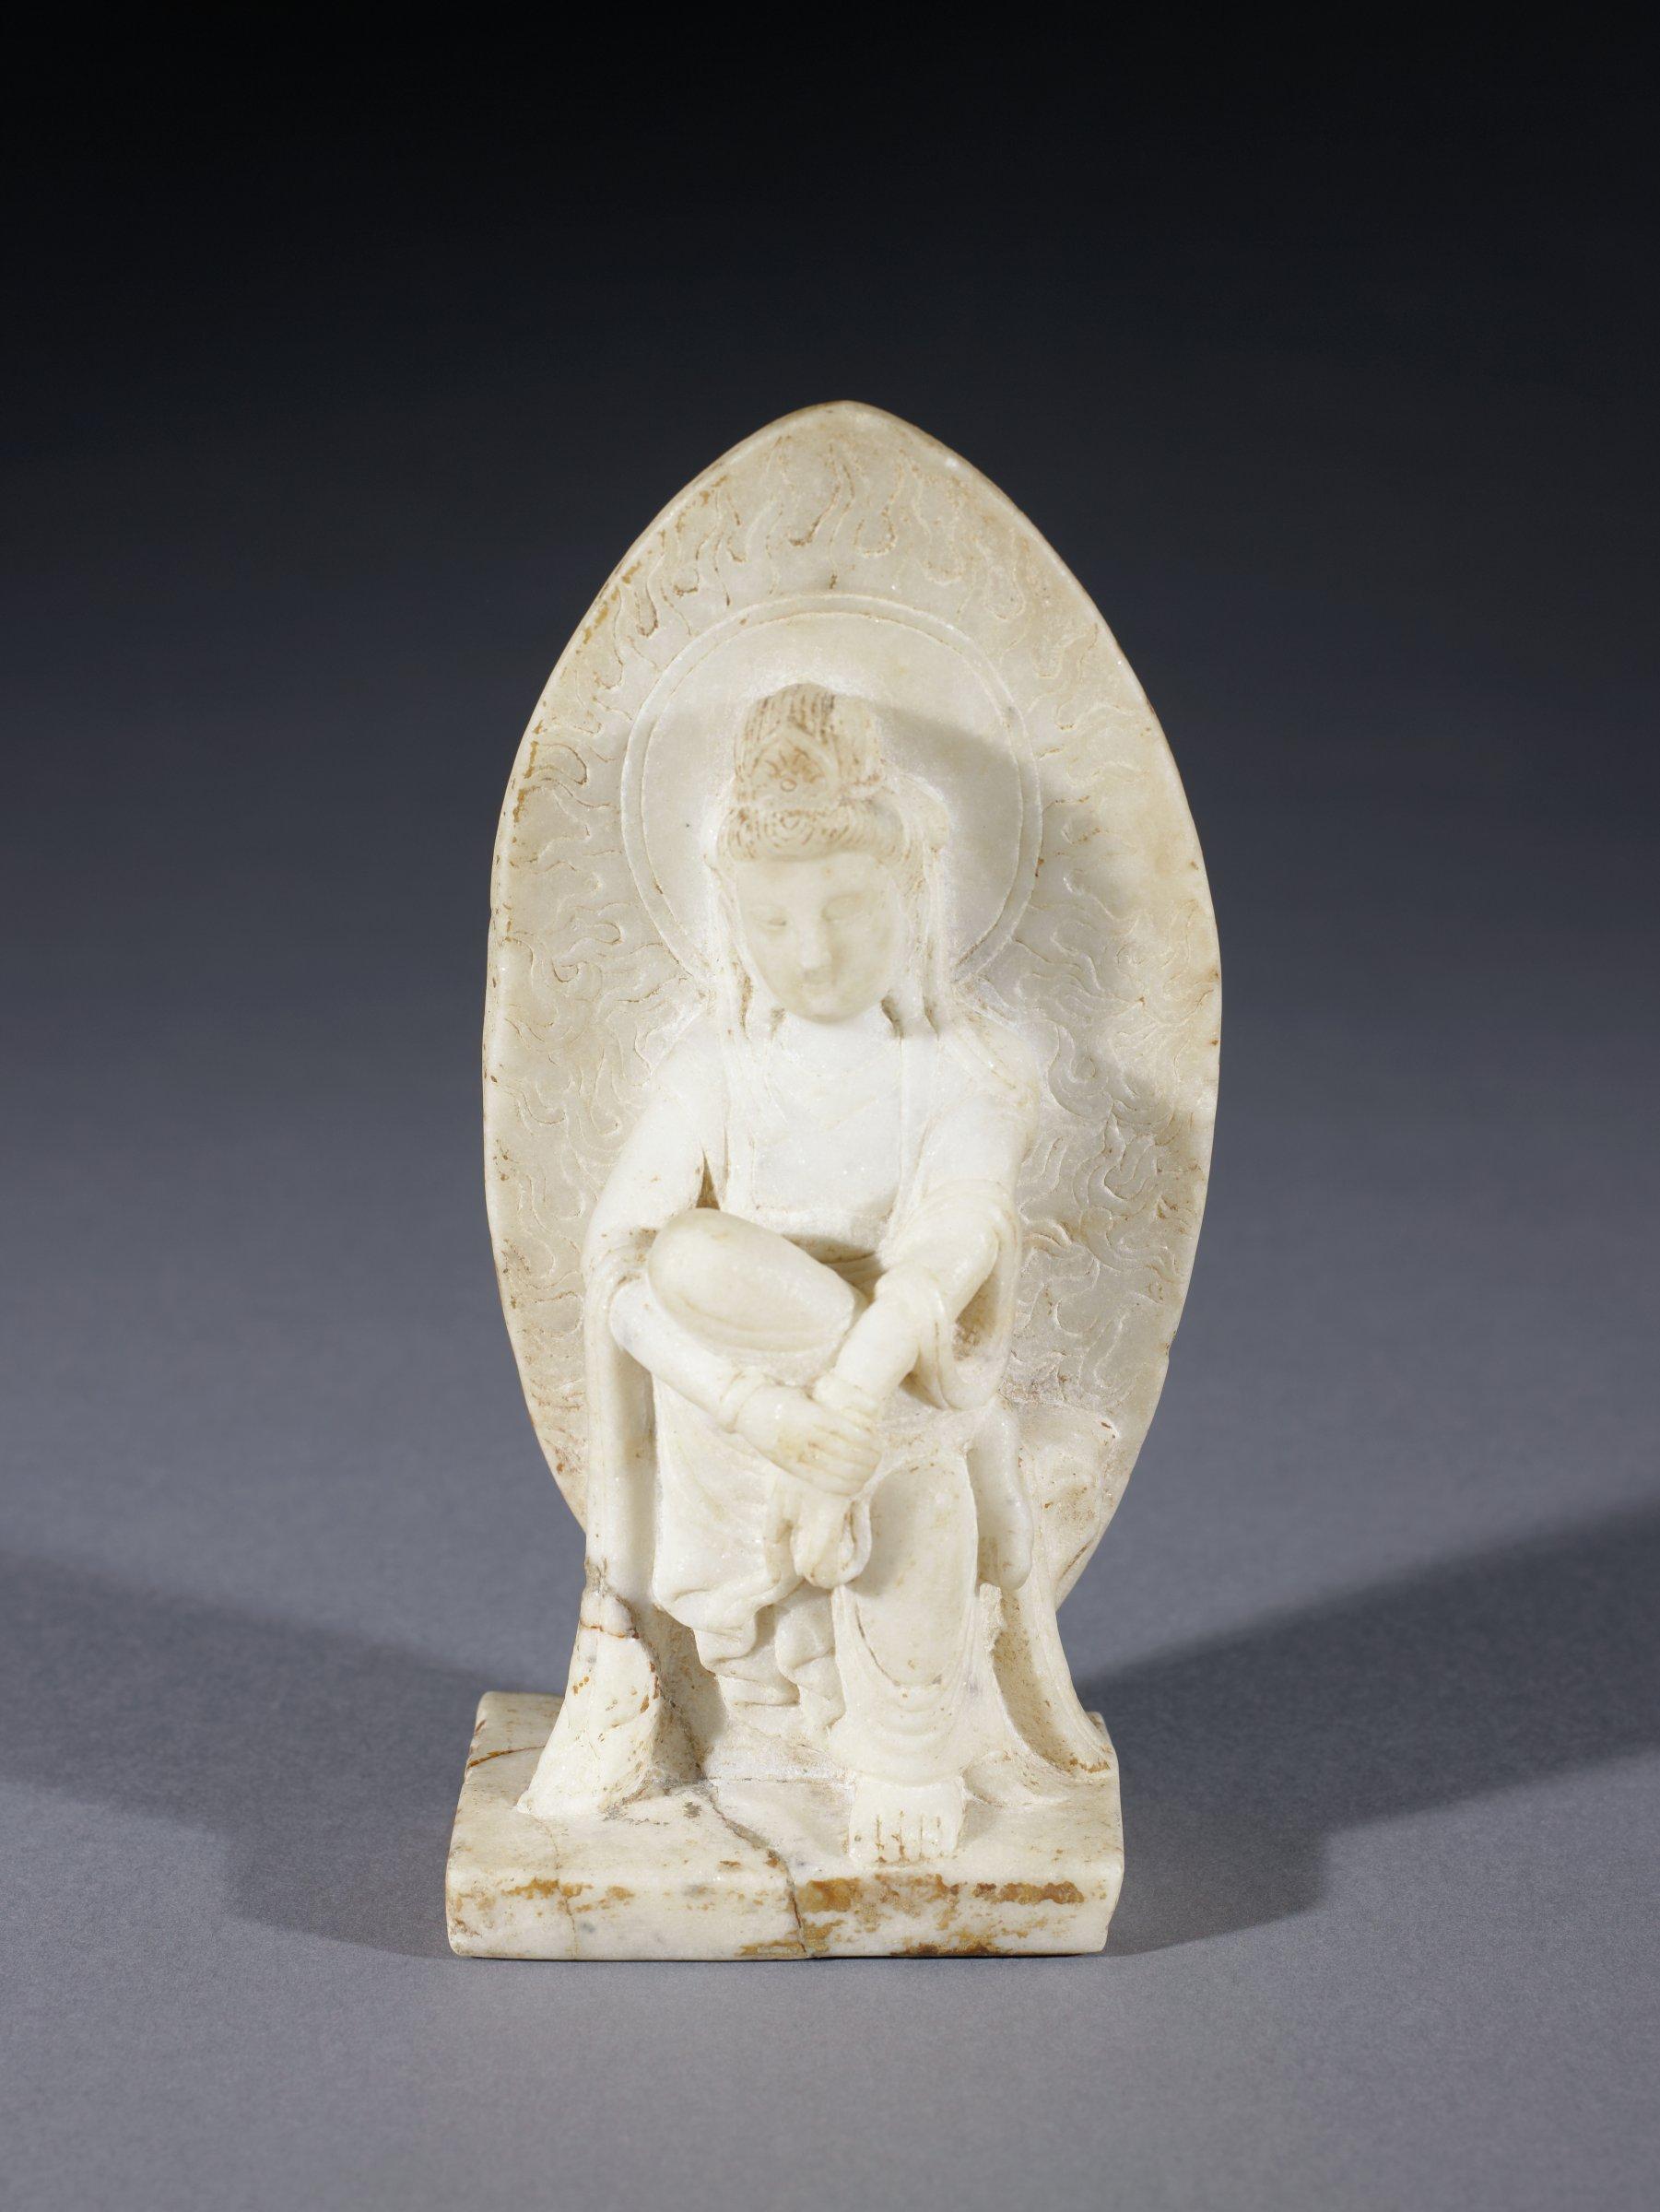 Pensive Bodhisattva, China, marble